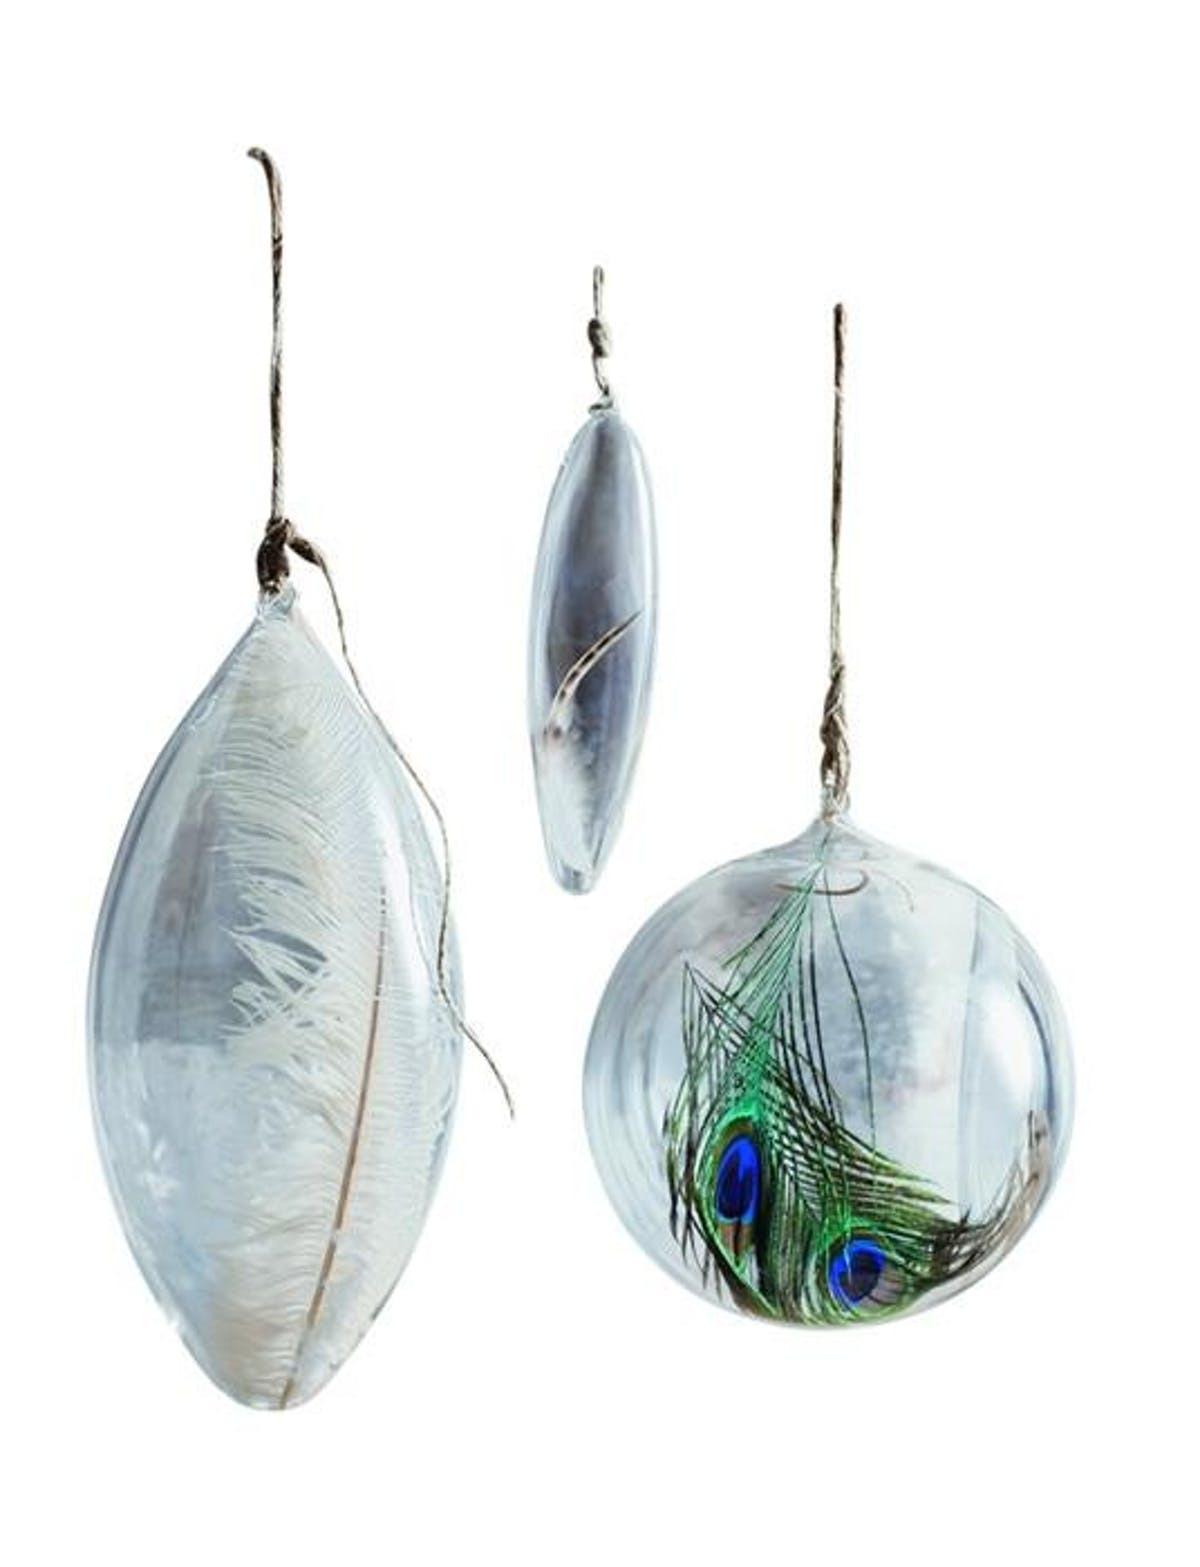 Roostルースト Floating Feather Ornaments Jumbo フェザーオーナメント大 3個セット